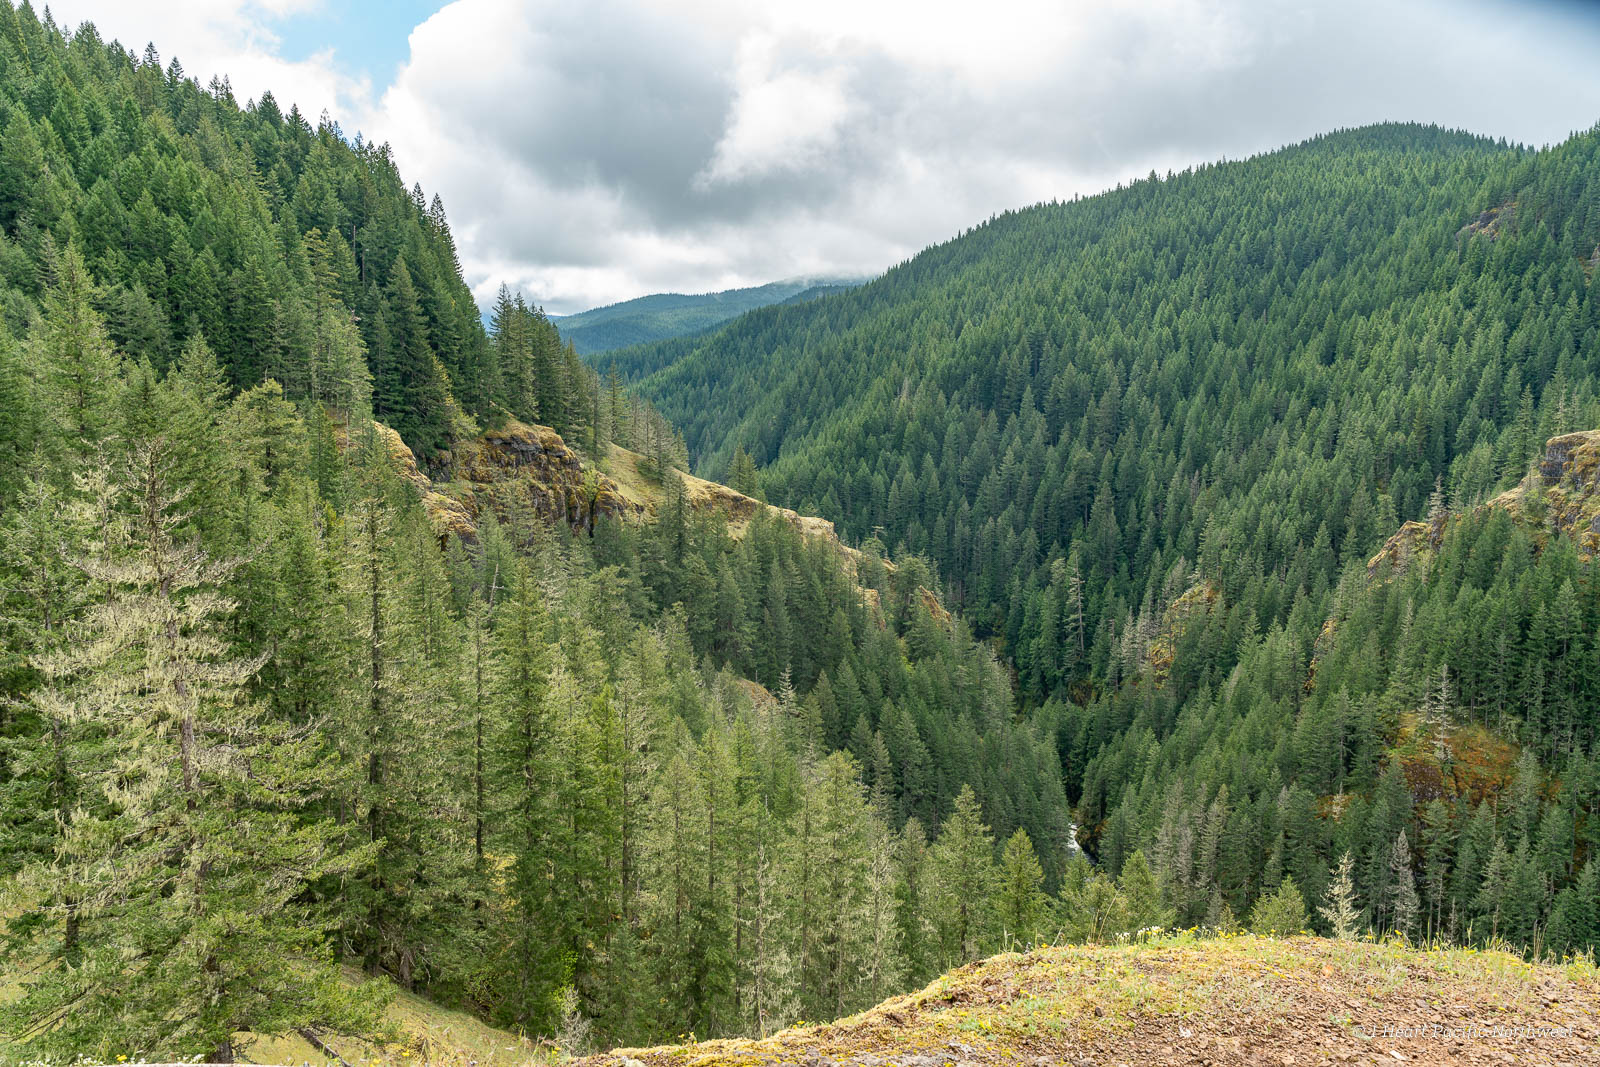 Salmon River Canyon - Goat Creek backpacking trip